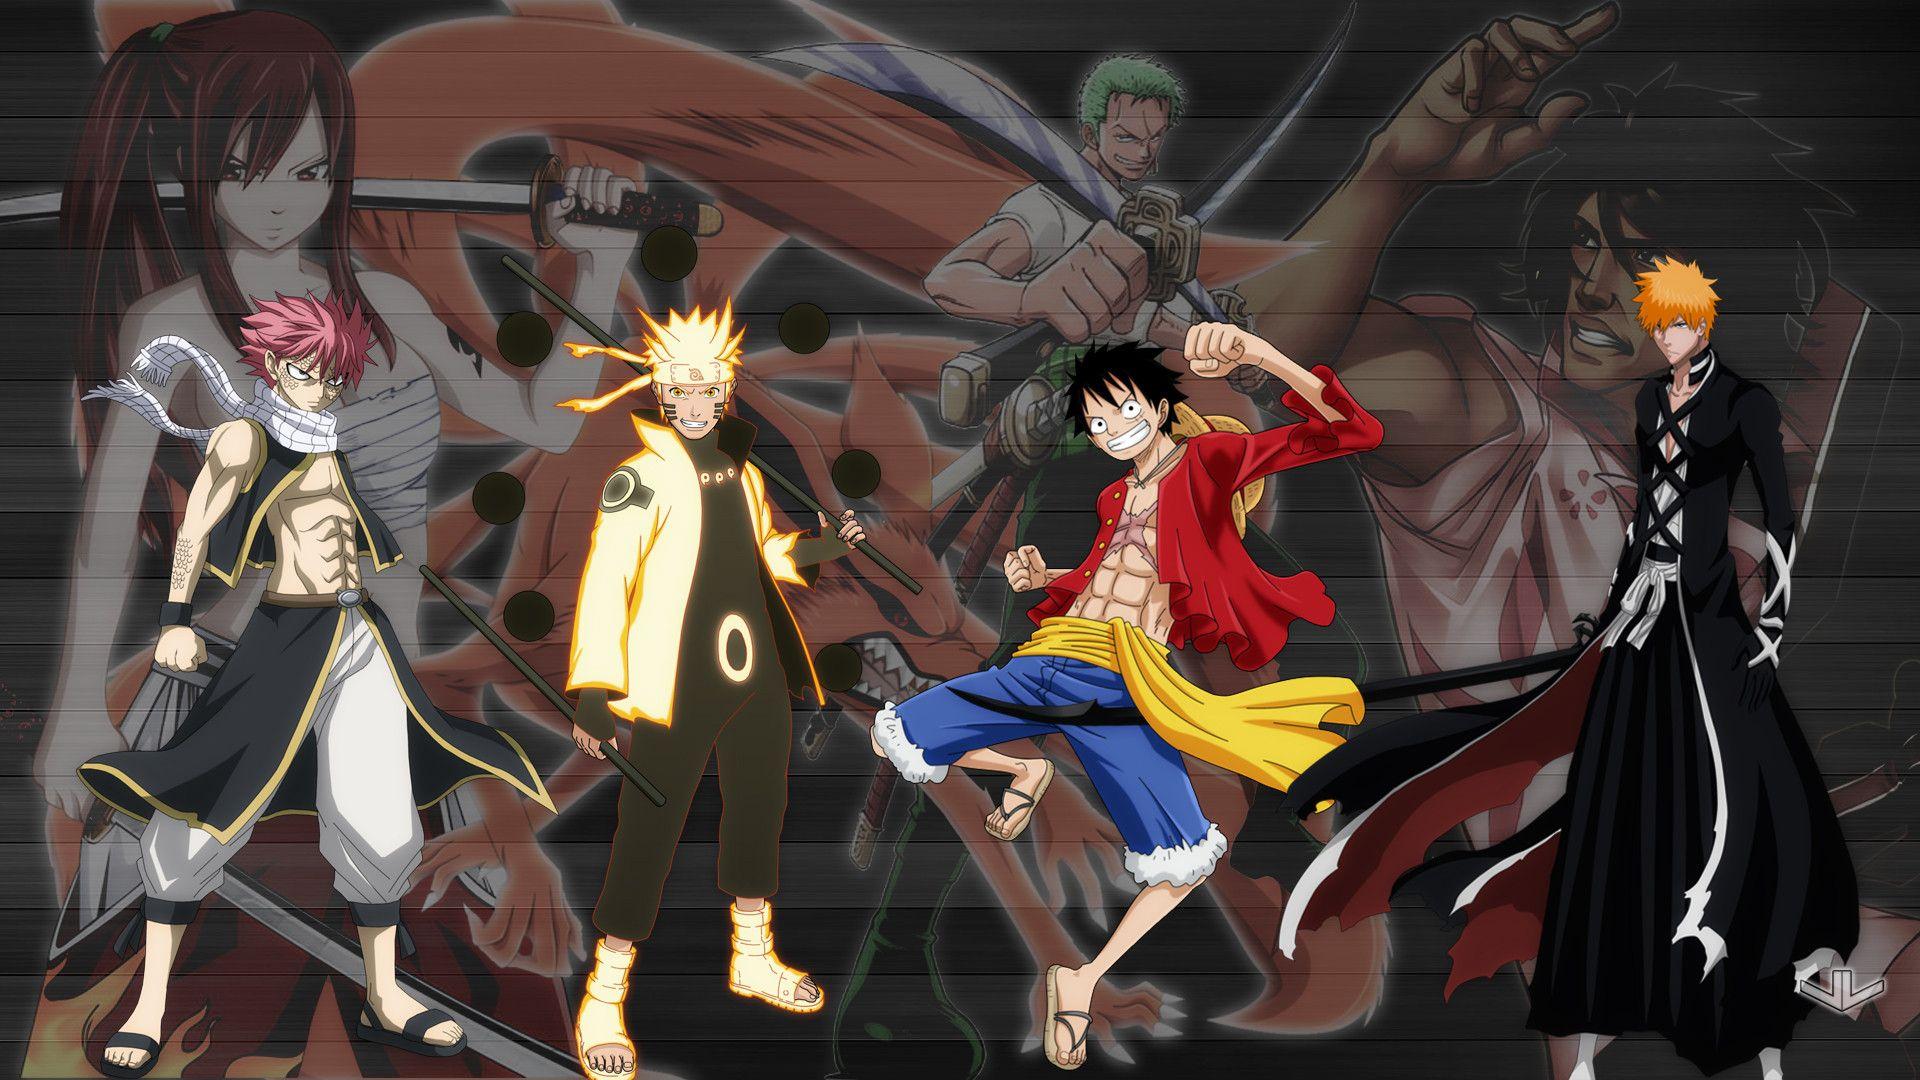 Anime Naruto Wallpaper Anime Crossover Anime crossover wallpaper 1920x1080